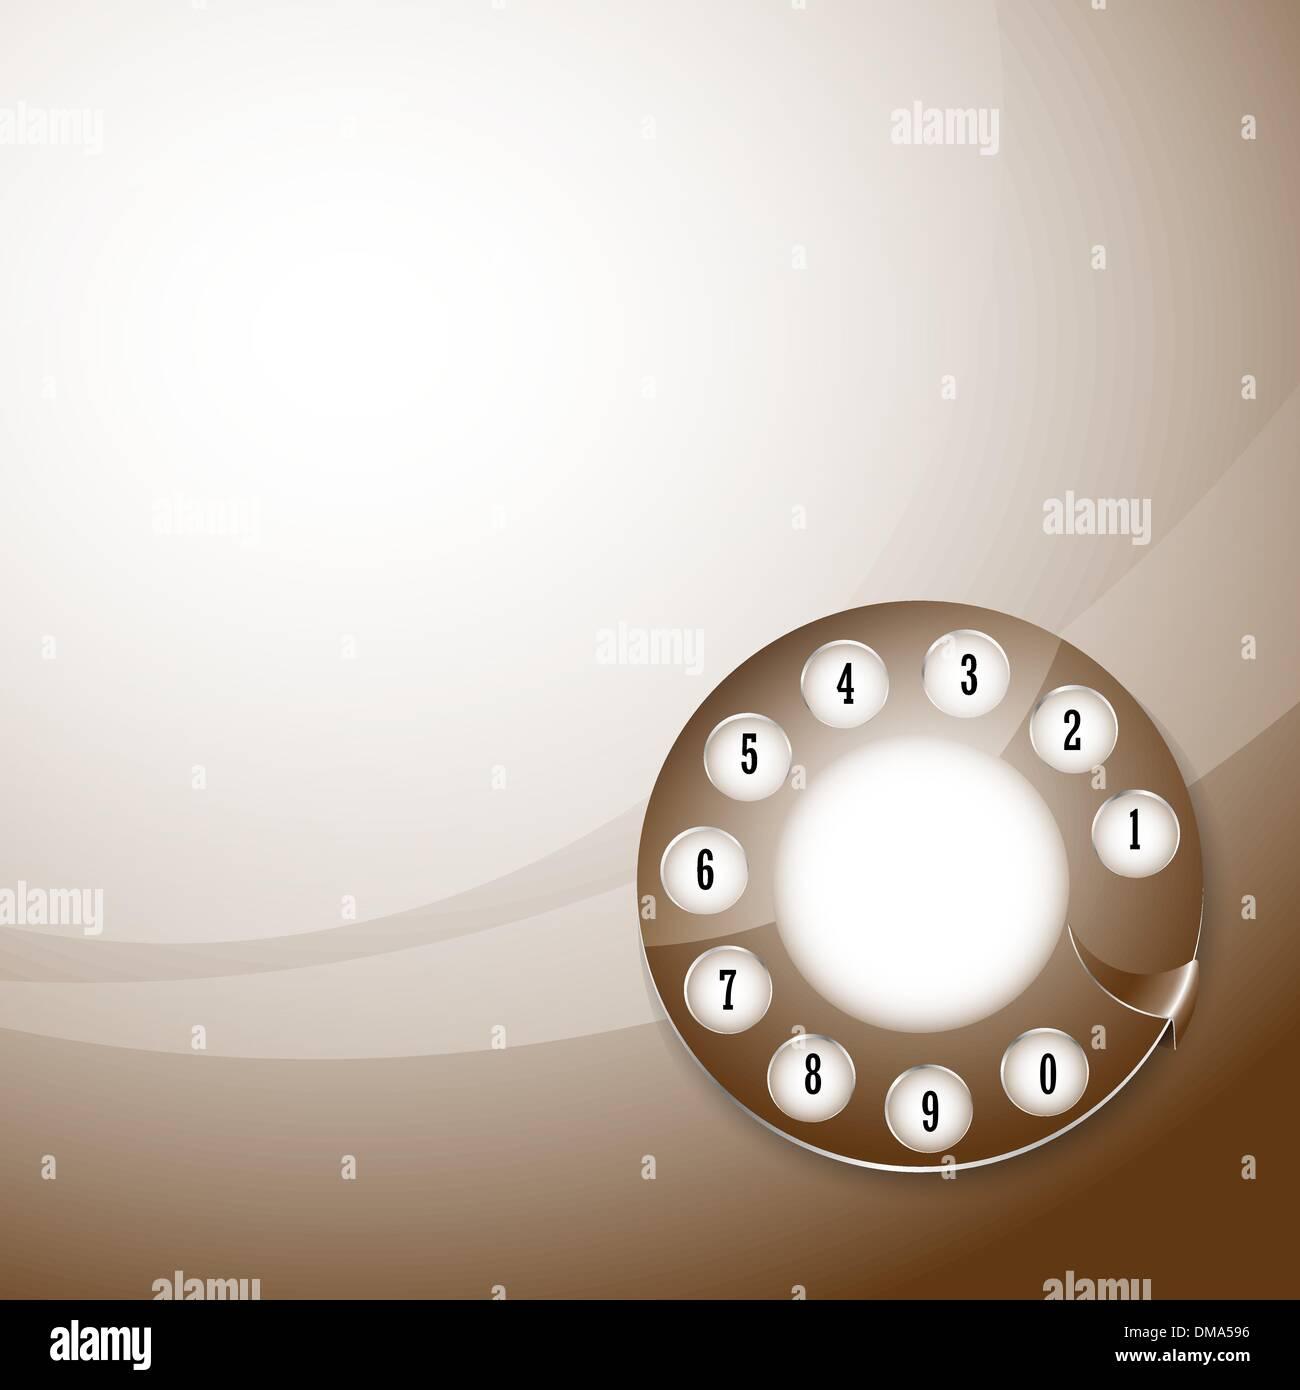 telephone disk background - Stock Image